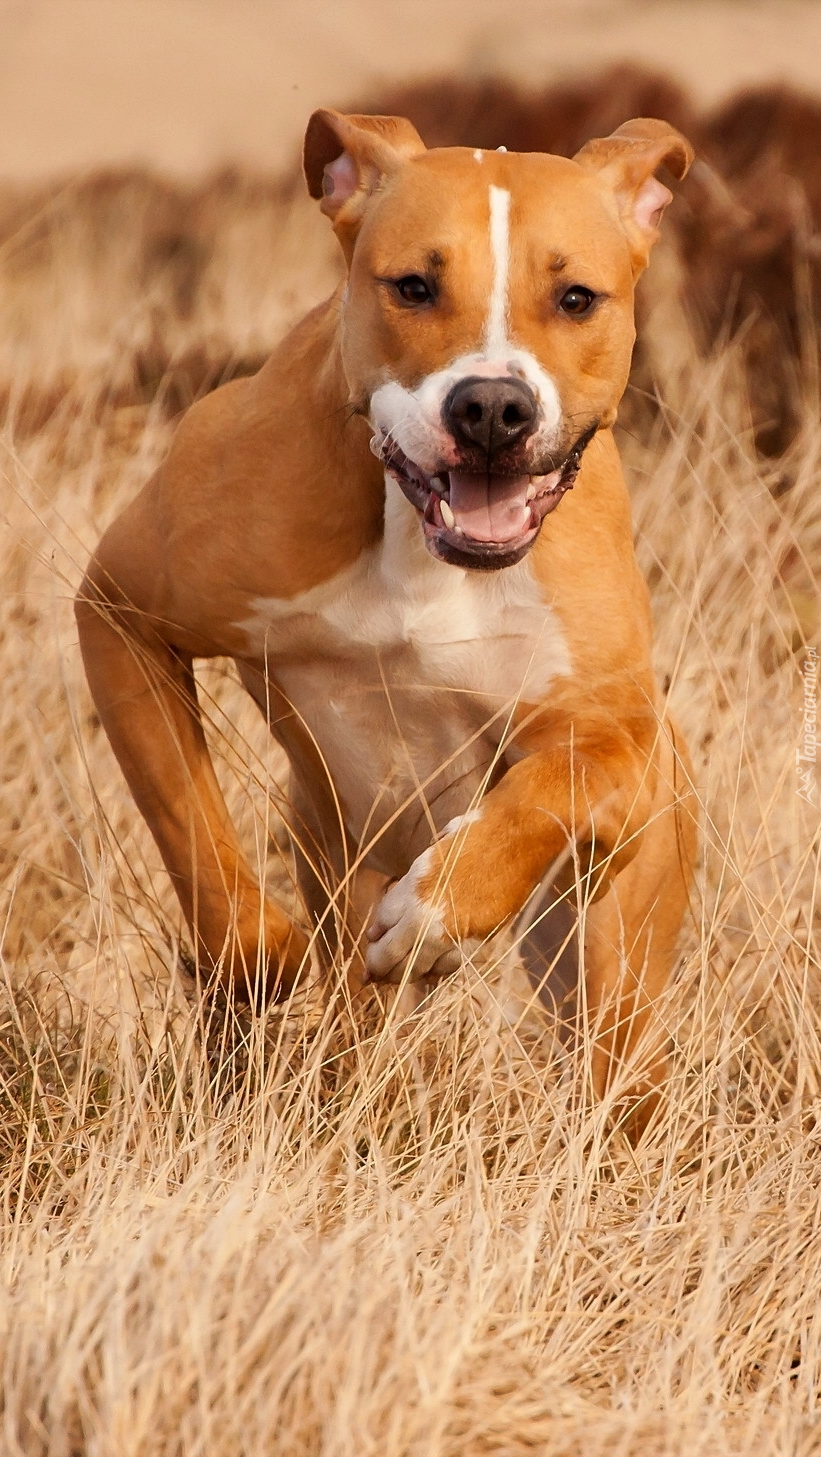 Bieg radosnego psa